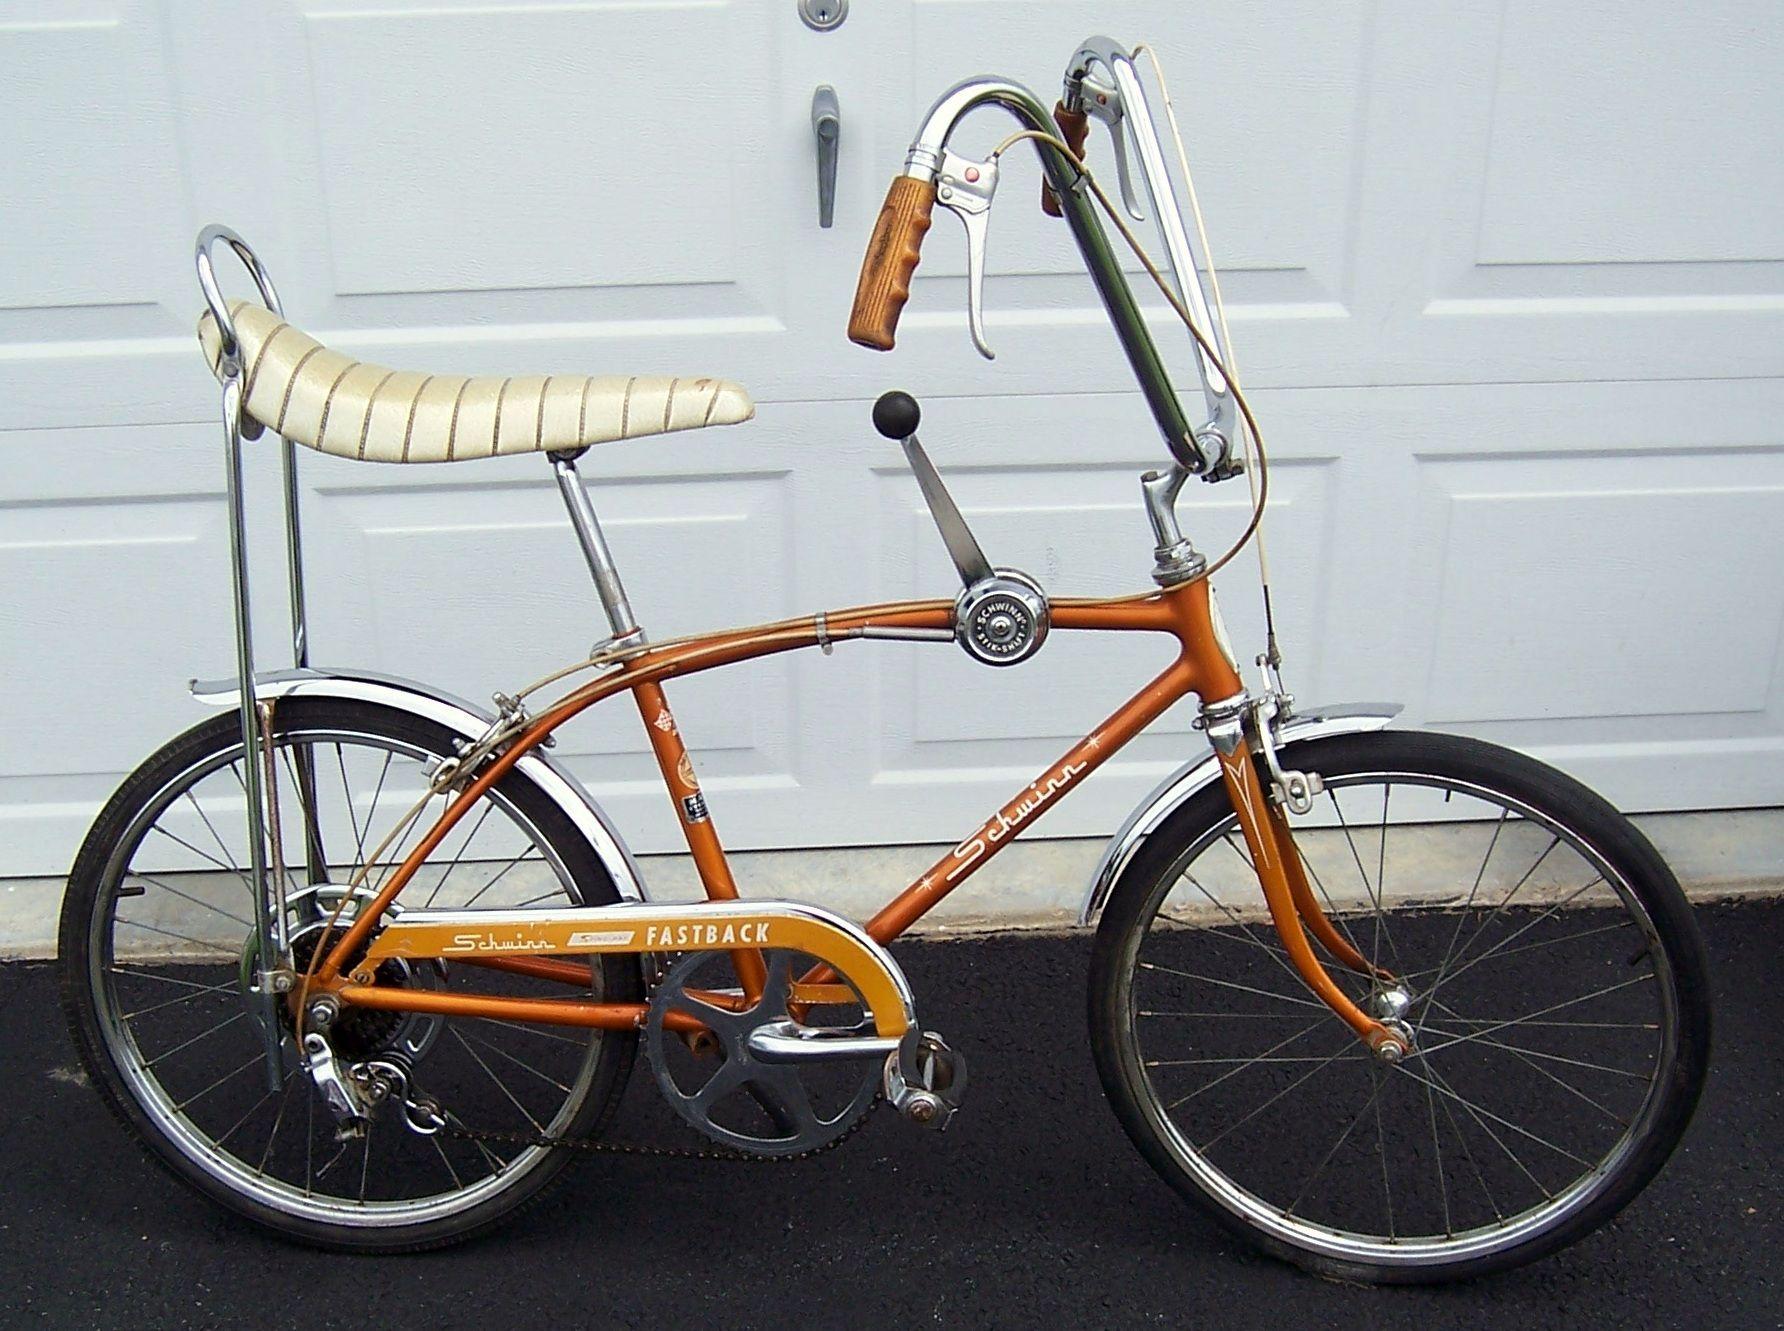 1966 Schwinn Coppertone Fastback Stingray Bicycle Schwinn Bike Schwinn Schwinn Bicycles